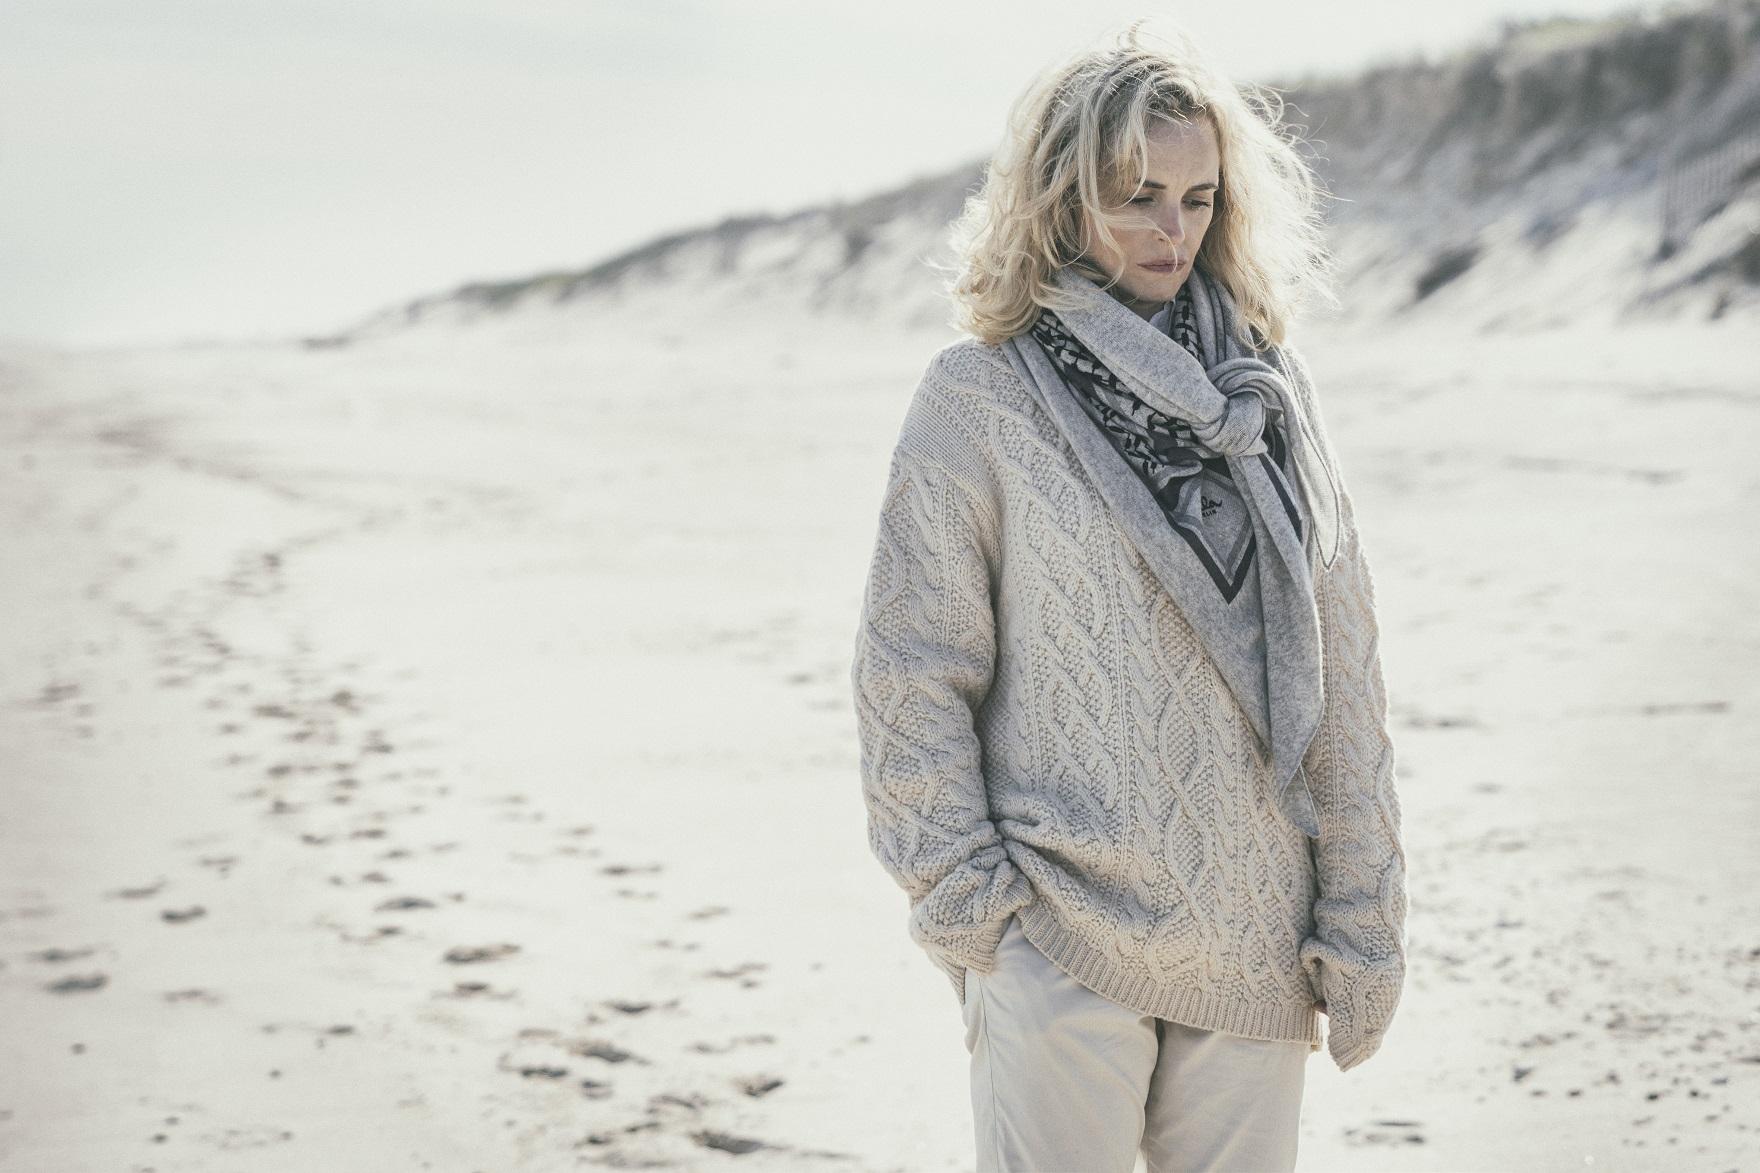 Return toMontauk, Volker Schlöndorff, Stellan Skarsgard, Nina Hoss